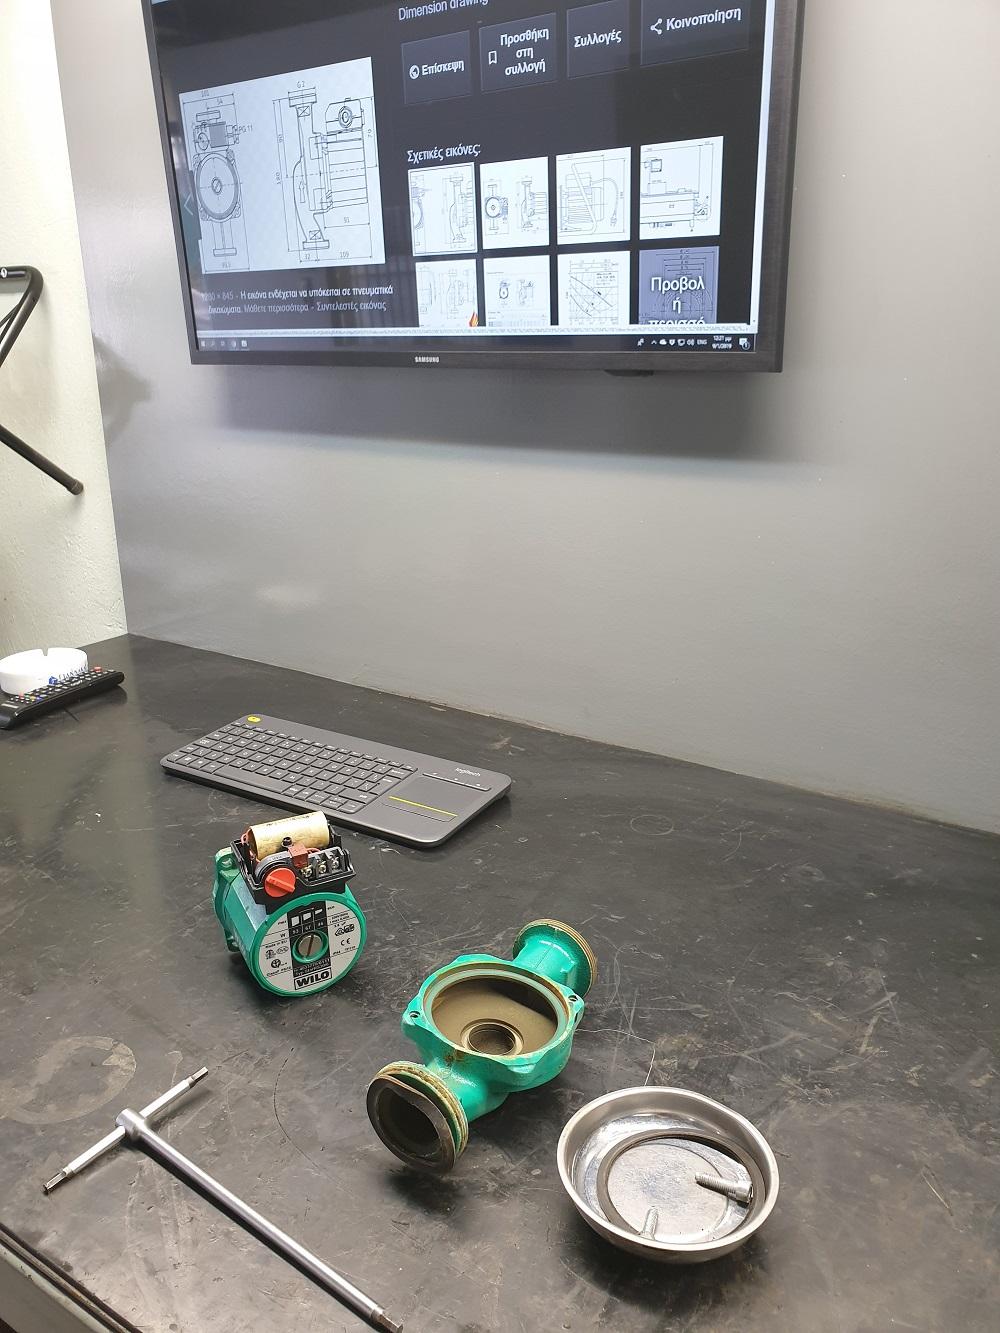 motorservice επισκευή αντλίας αντλιών κυκλοφορητή πιεστικού service λυμάτων Αθήνα wilo grundfos dab lowara abs sulzer pentax kraft